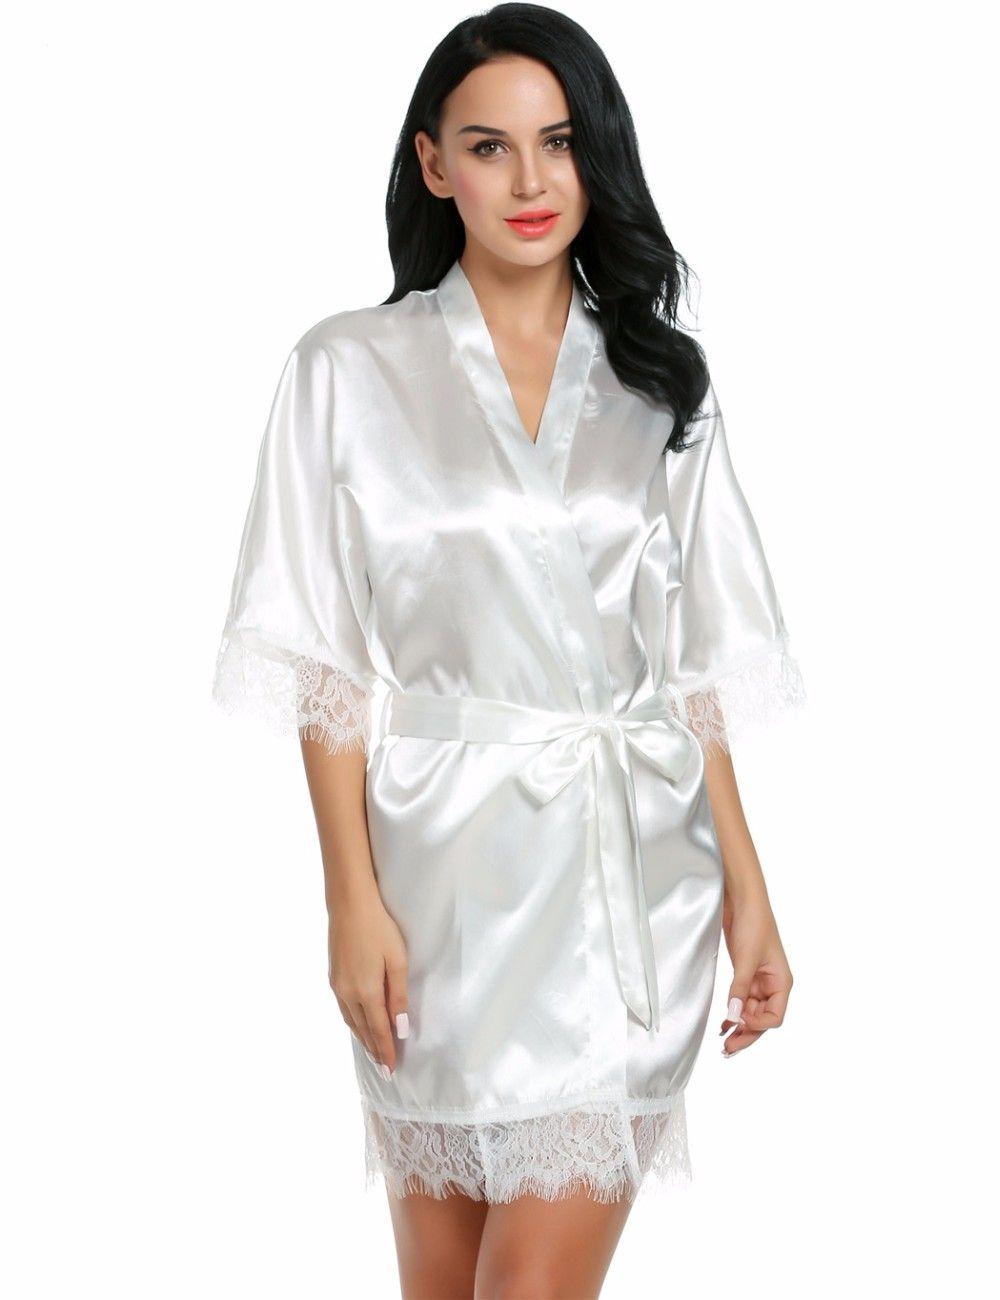 b2fc77f29  33.99 - Nice Sexy Wedding Dressing Gown Women Short Satin Bride Robe Lace  Silk Kimono Bathrobe Summer Bridesmaid Nightwear Plus Size Peignoir - Buy  it Now!